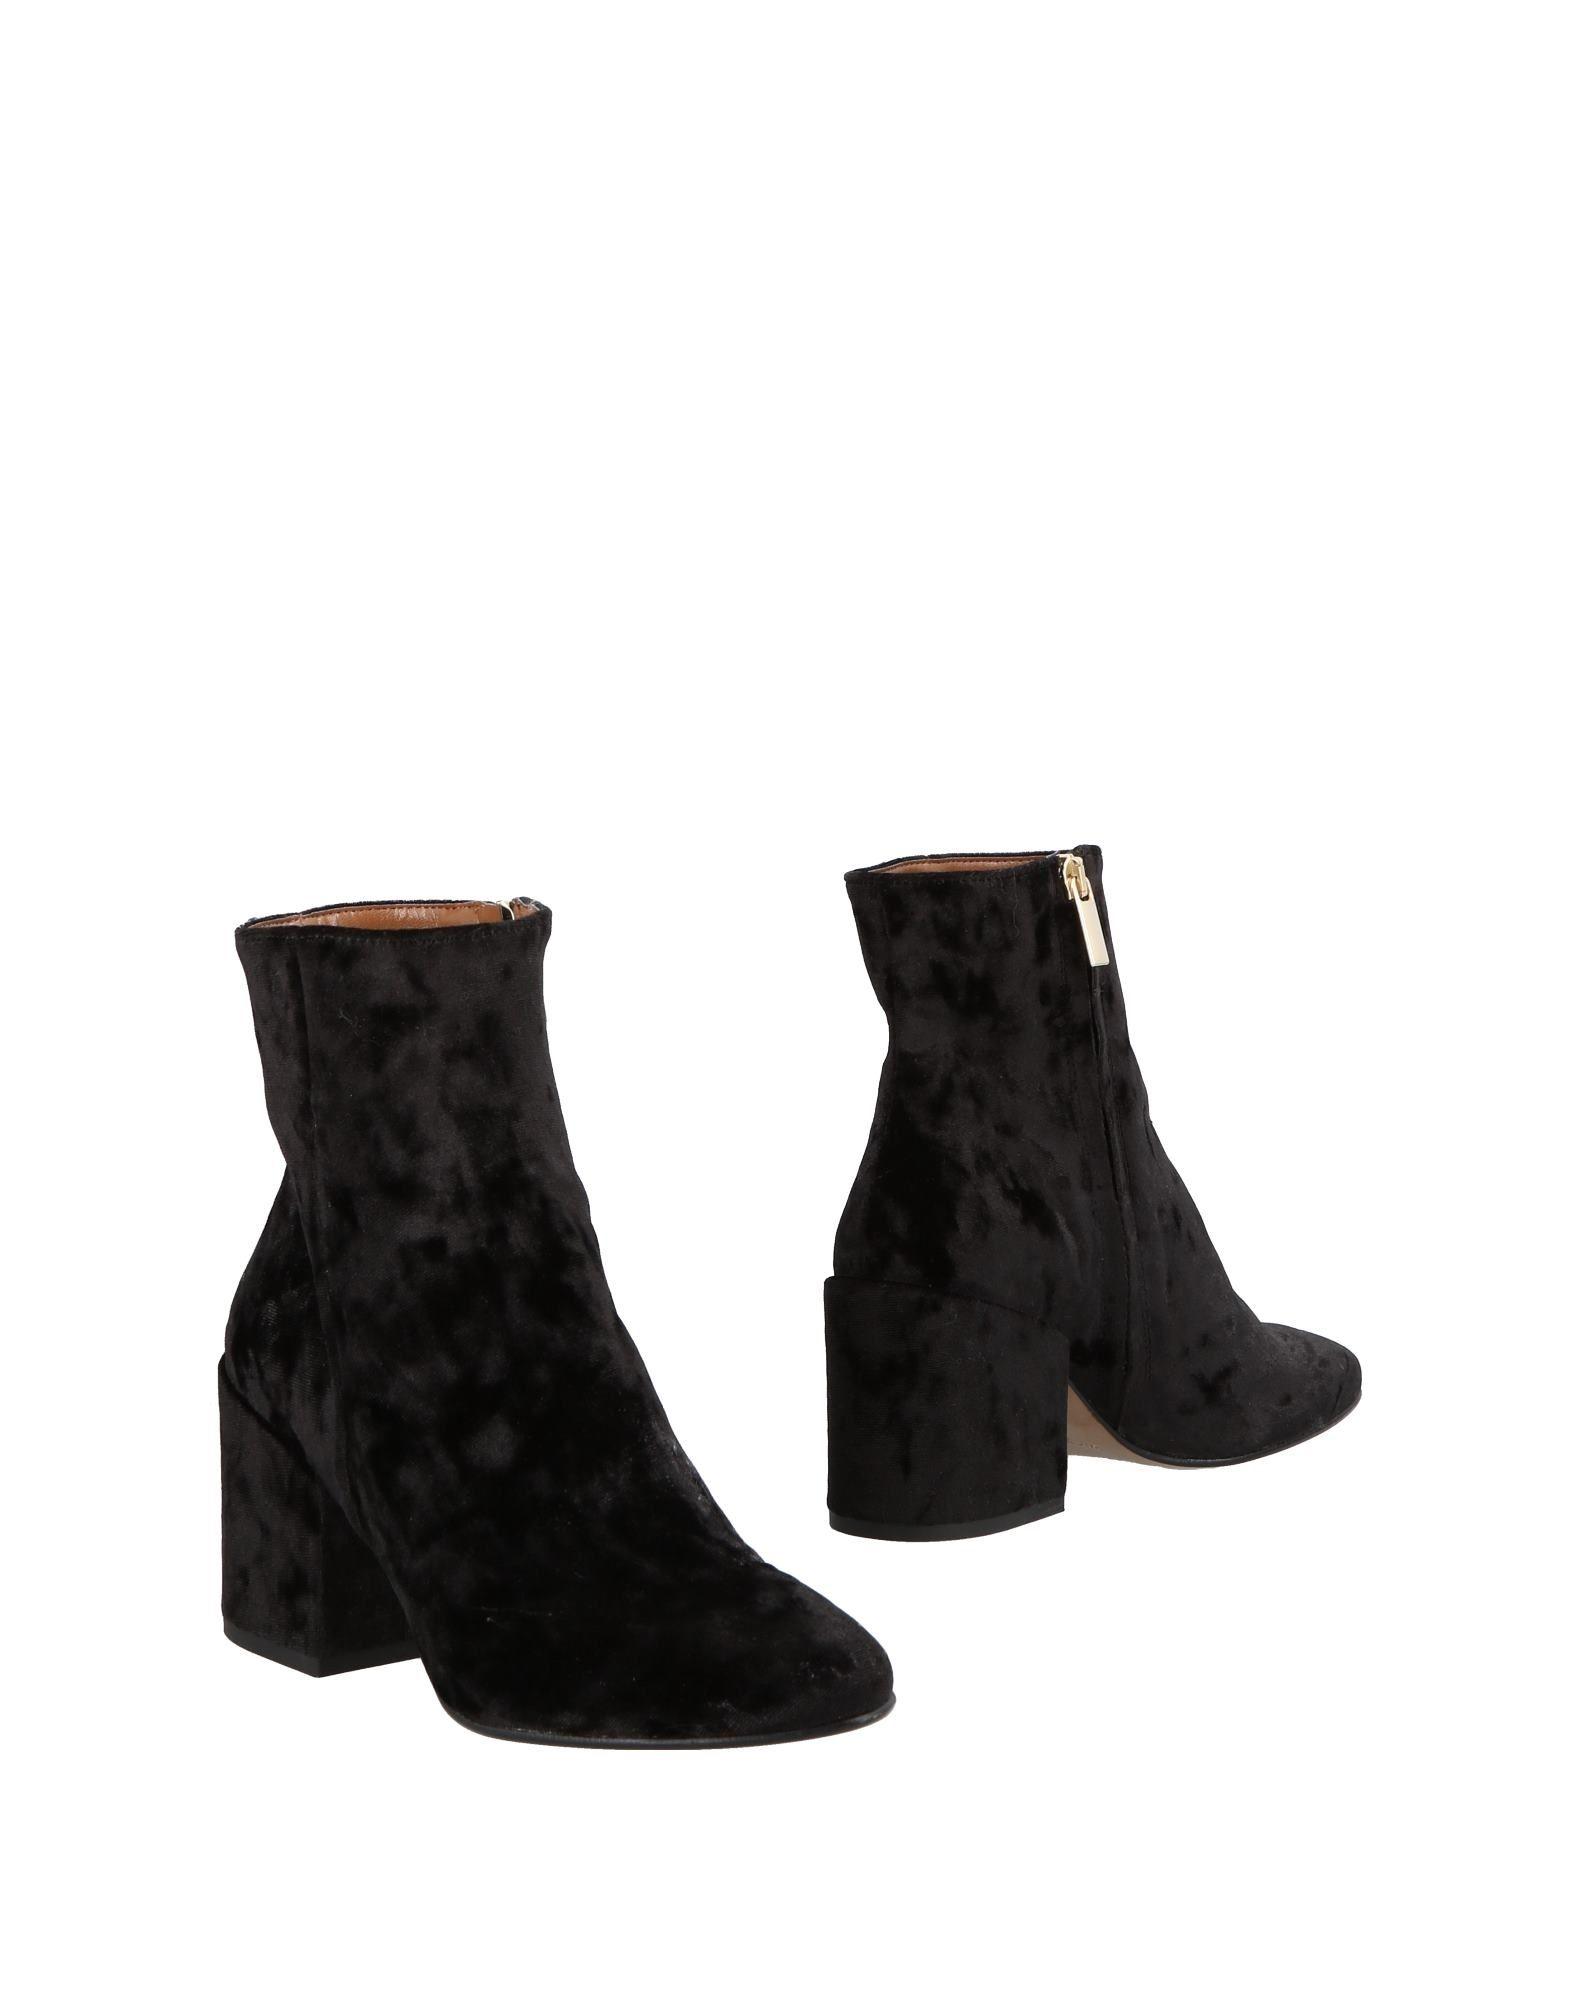 Bianca Di Stiefelette Damen beliebte  11471127IP Gute Qualität beliebte Damen Schuhe 322fdb